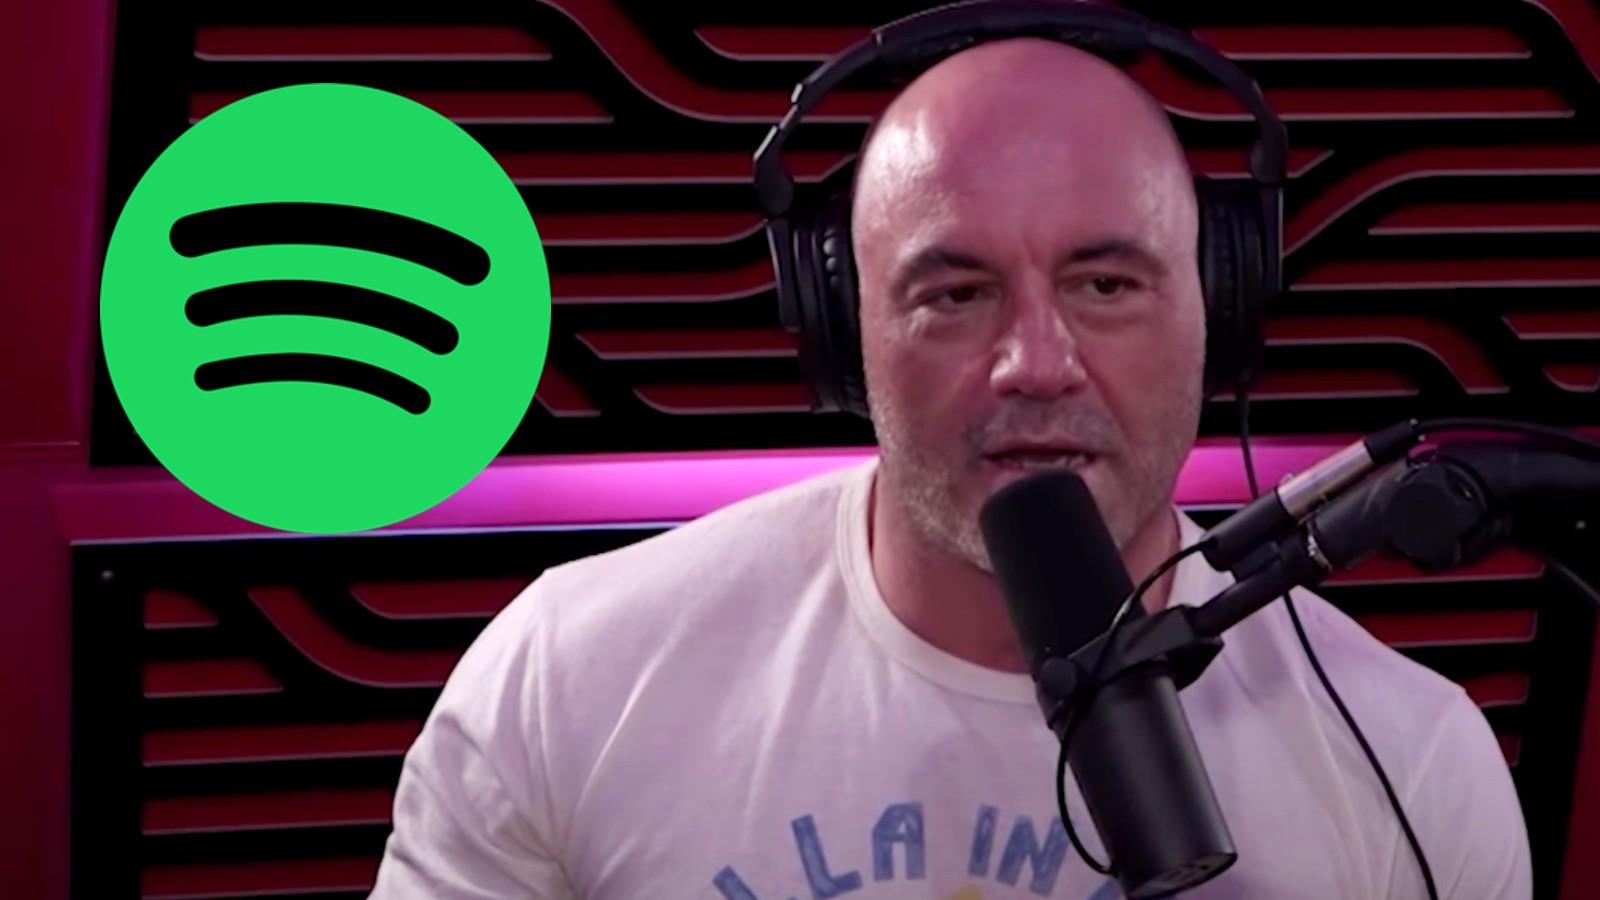 Joe Rogan in his podcast studio next to the Spotify logo